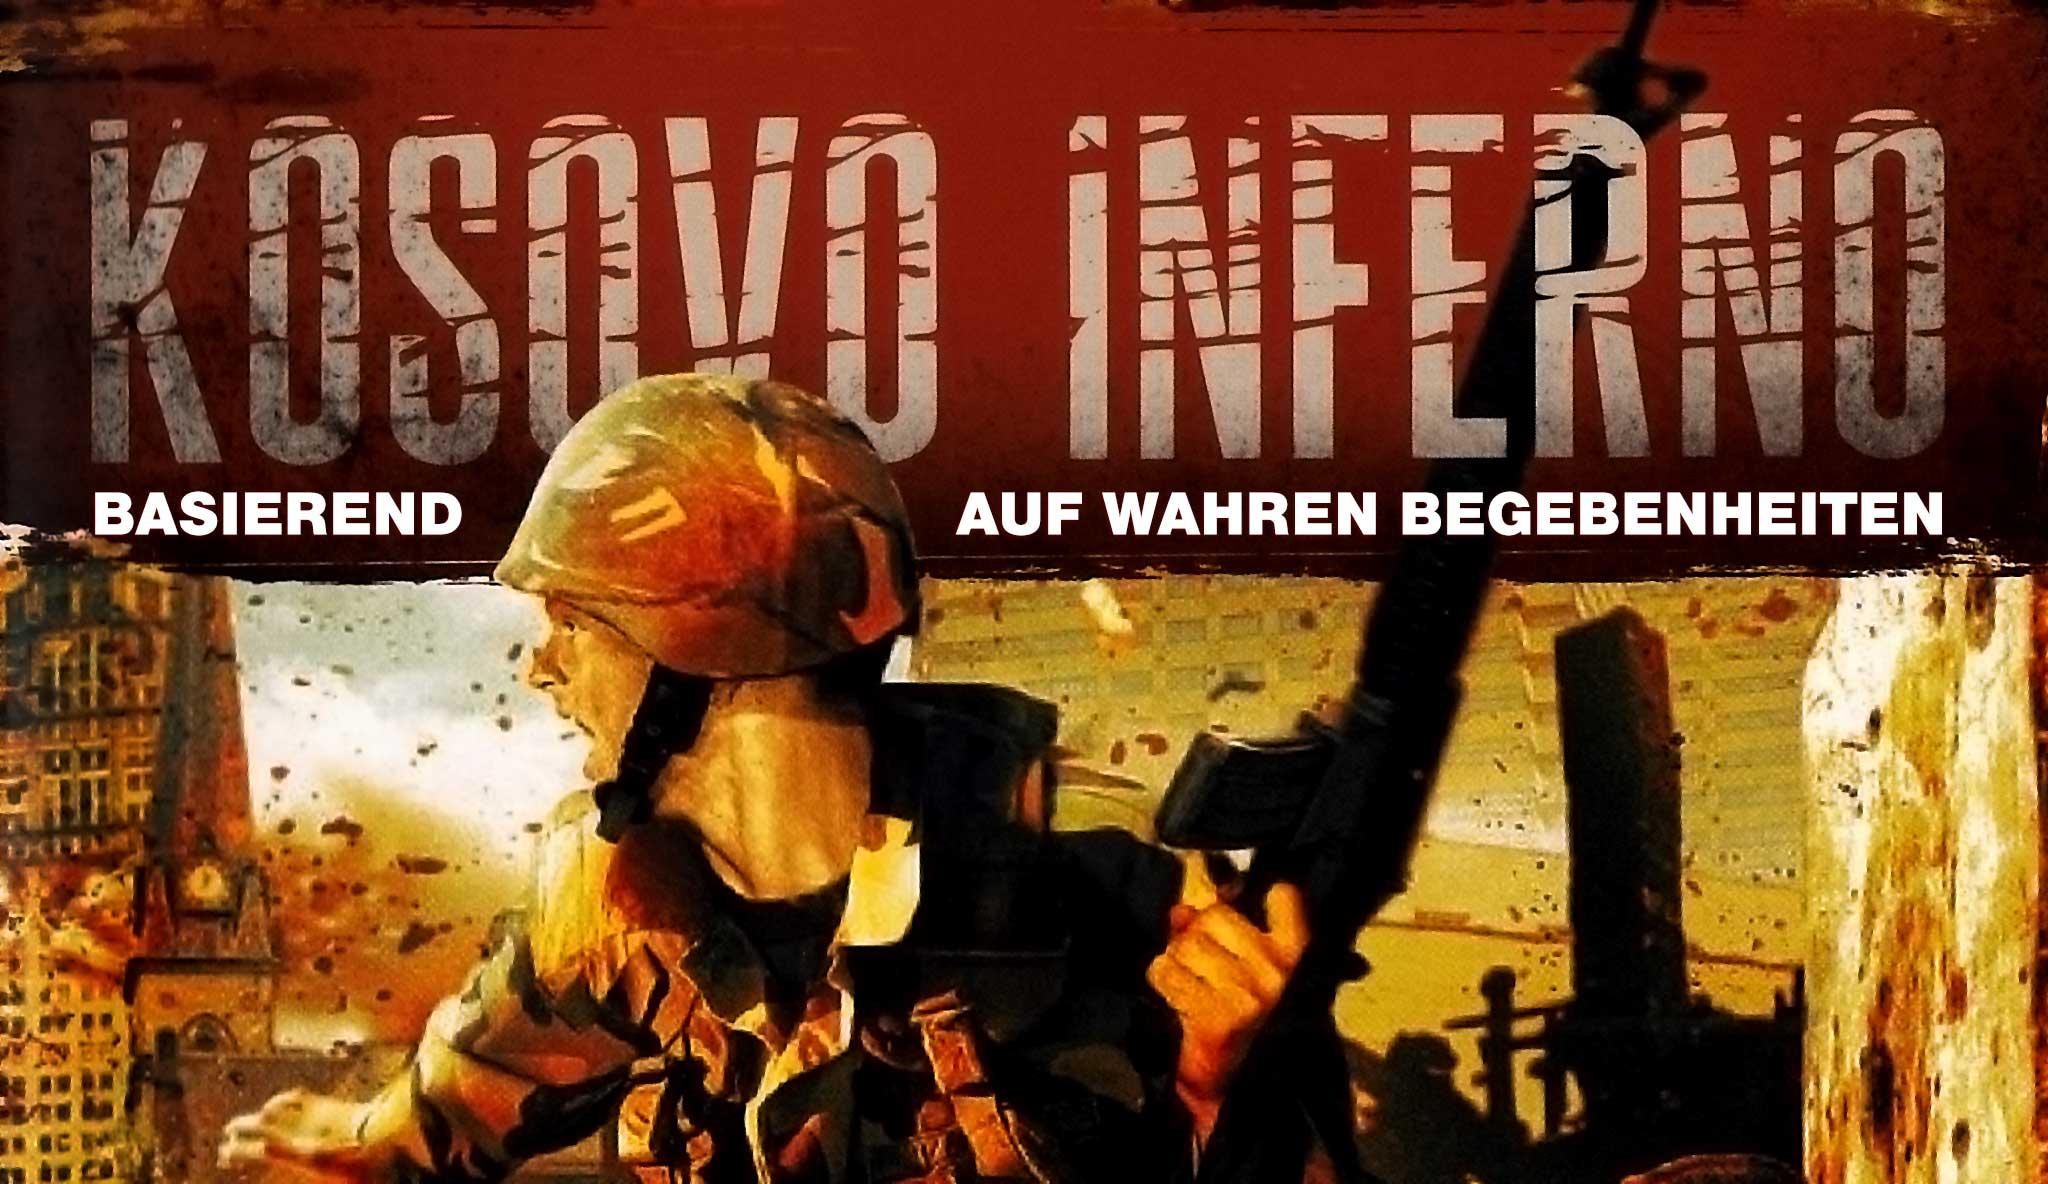 kosovo-inferno\header.jpg